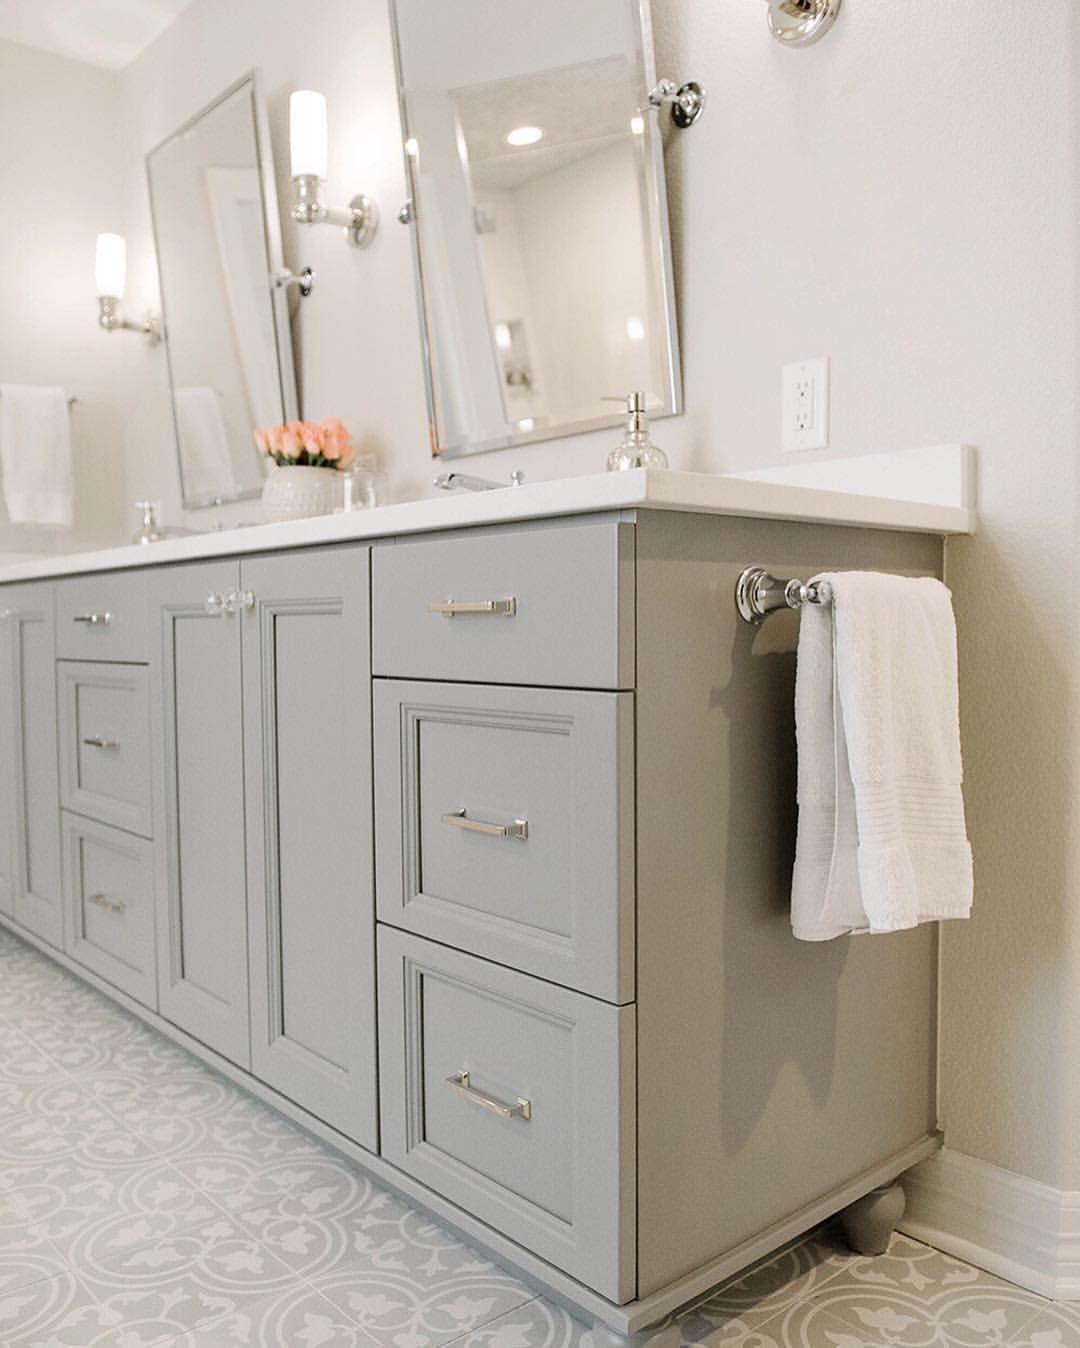 pin by chelsea bekker on bathroom in 2019 painting cabinets rh pinterest co uk